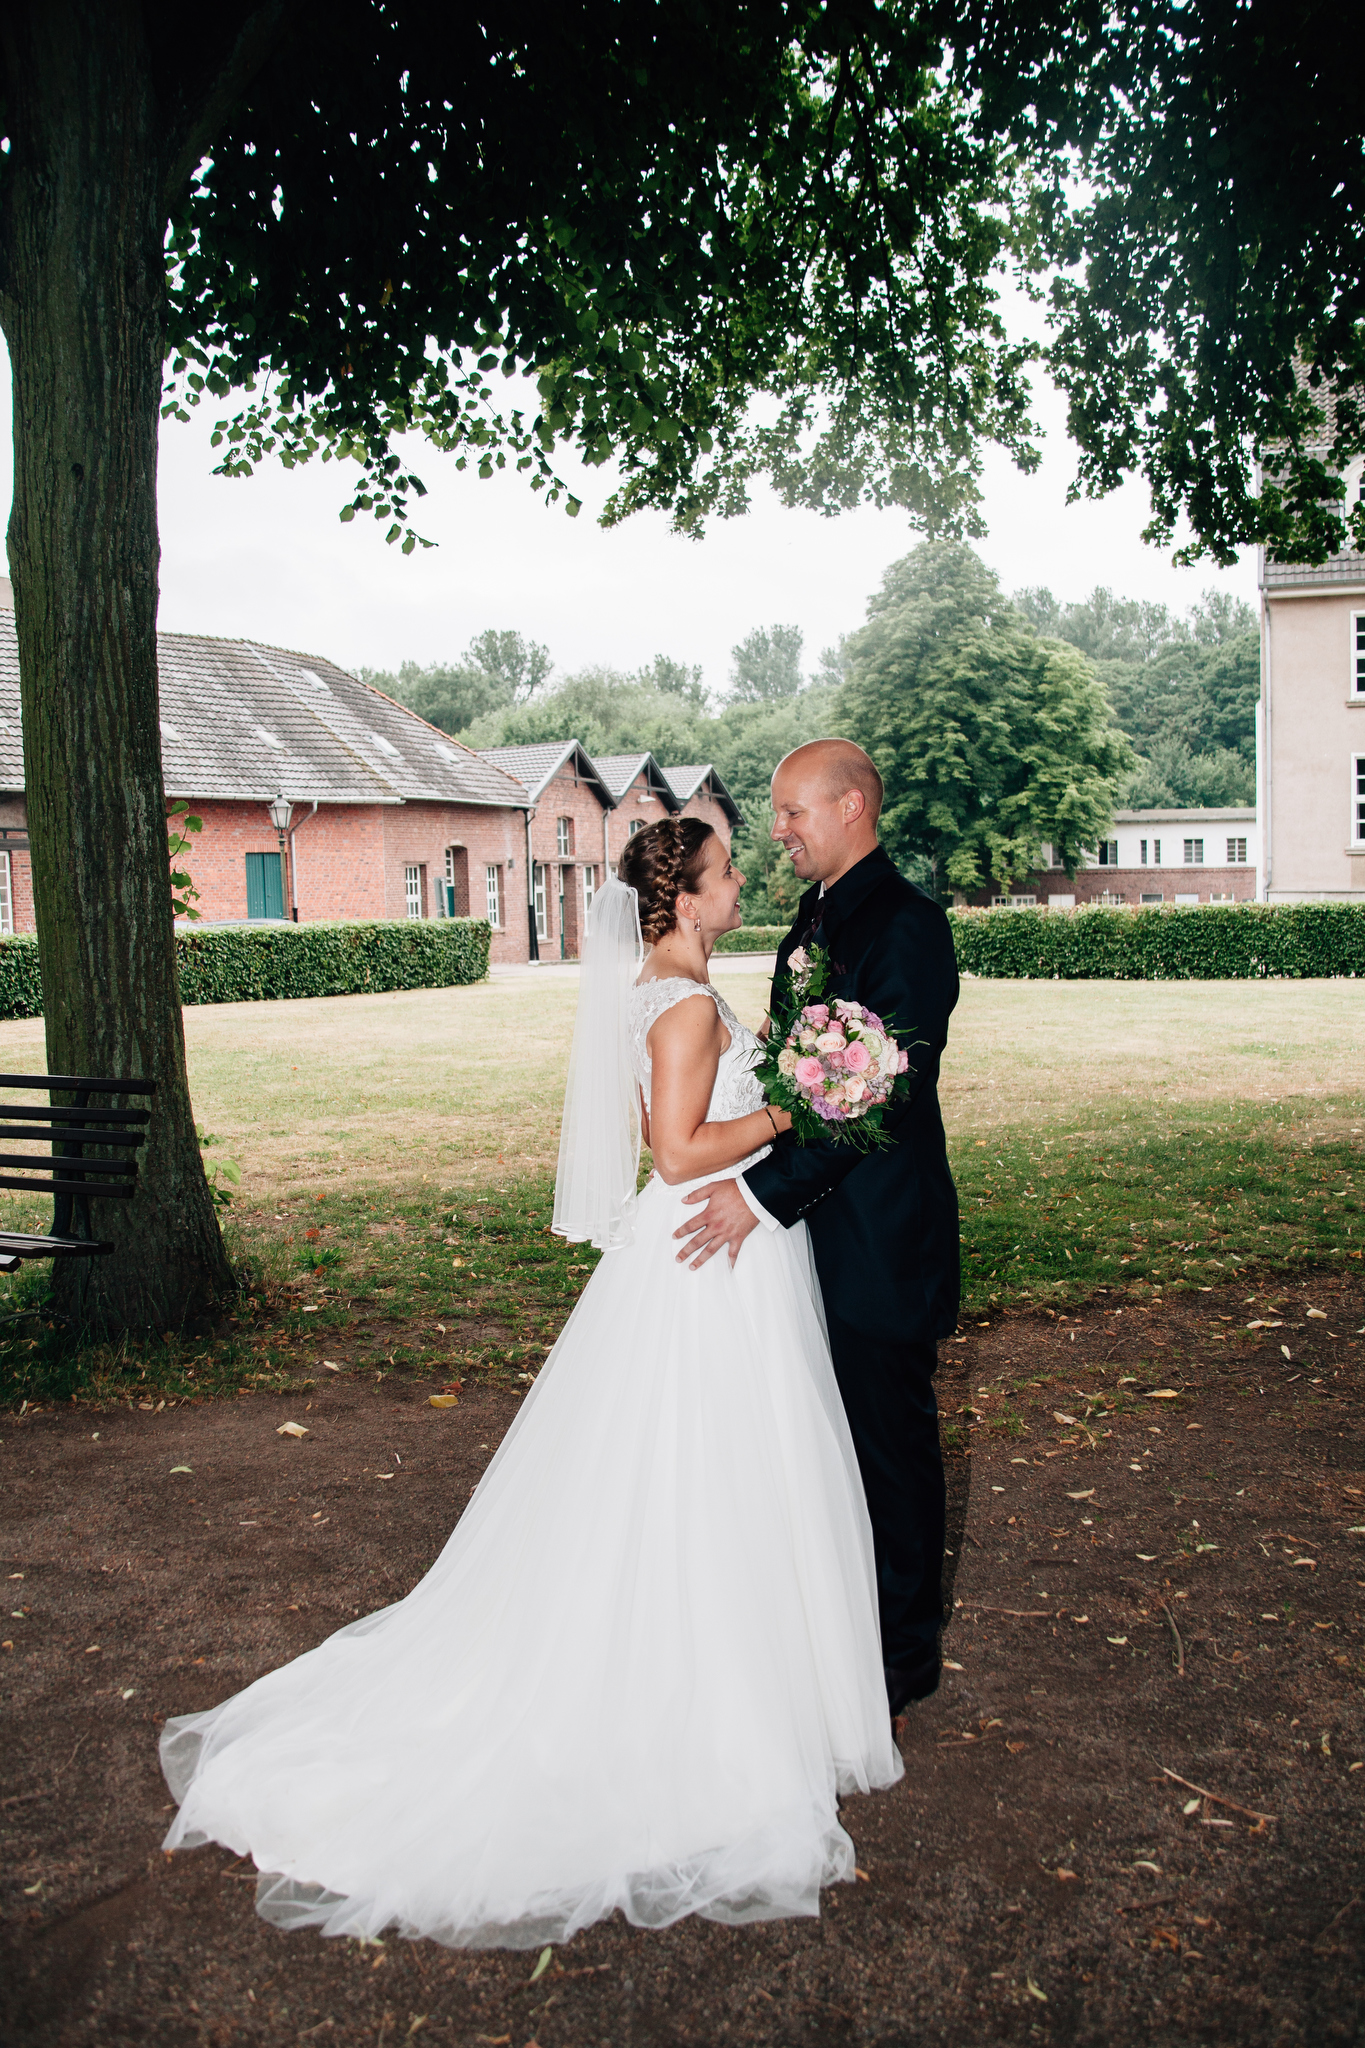 Claudia Krawinkel Fotografie Hochzeitsfotograf Essen Düsseldorf Dormagen Kloster Knechtsteden Hochzeitsreportage Hochzeit Knechtsteden102